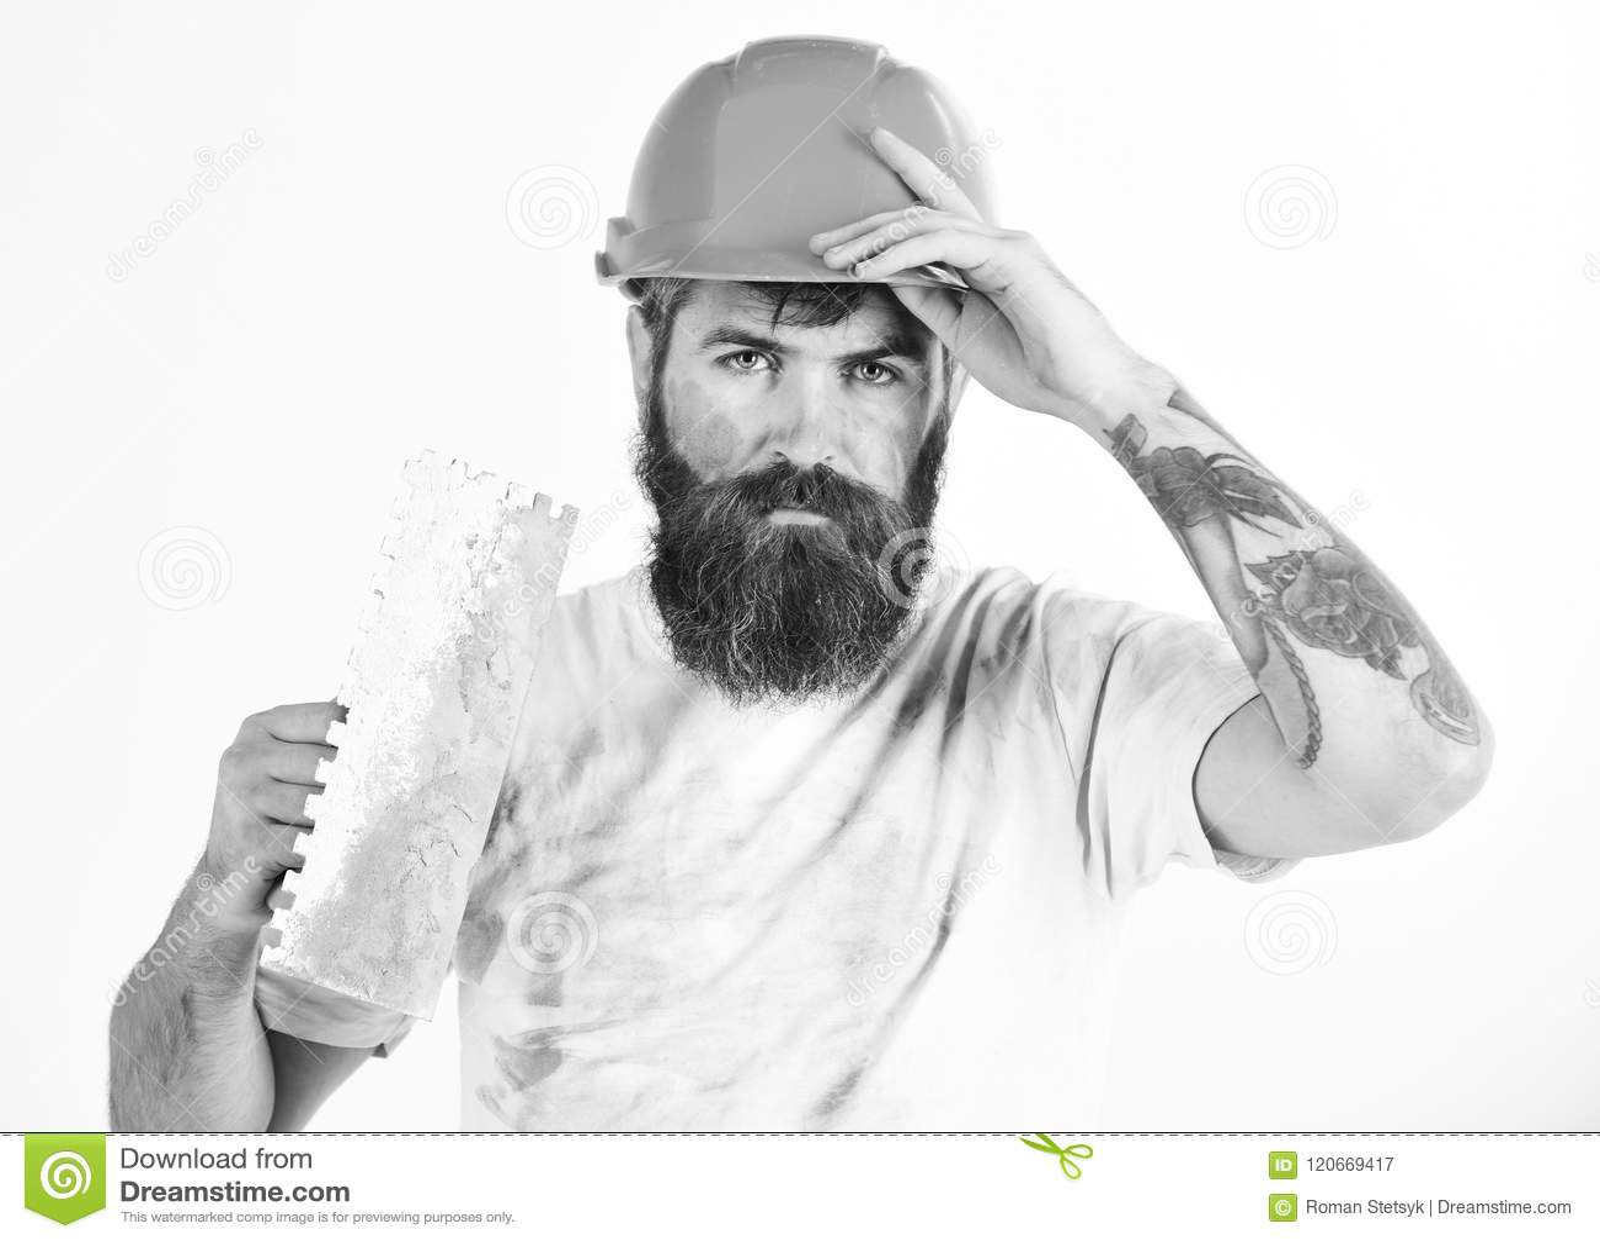 O pintor, o estucador, o reparador, o contramestre no capacete ou o capacete de segurança guardam a faca de massa de vidraceiro,